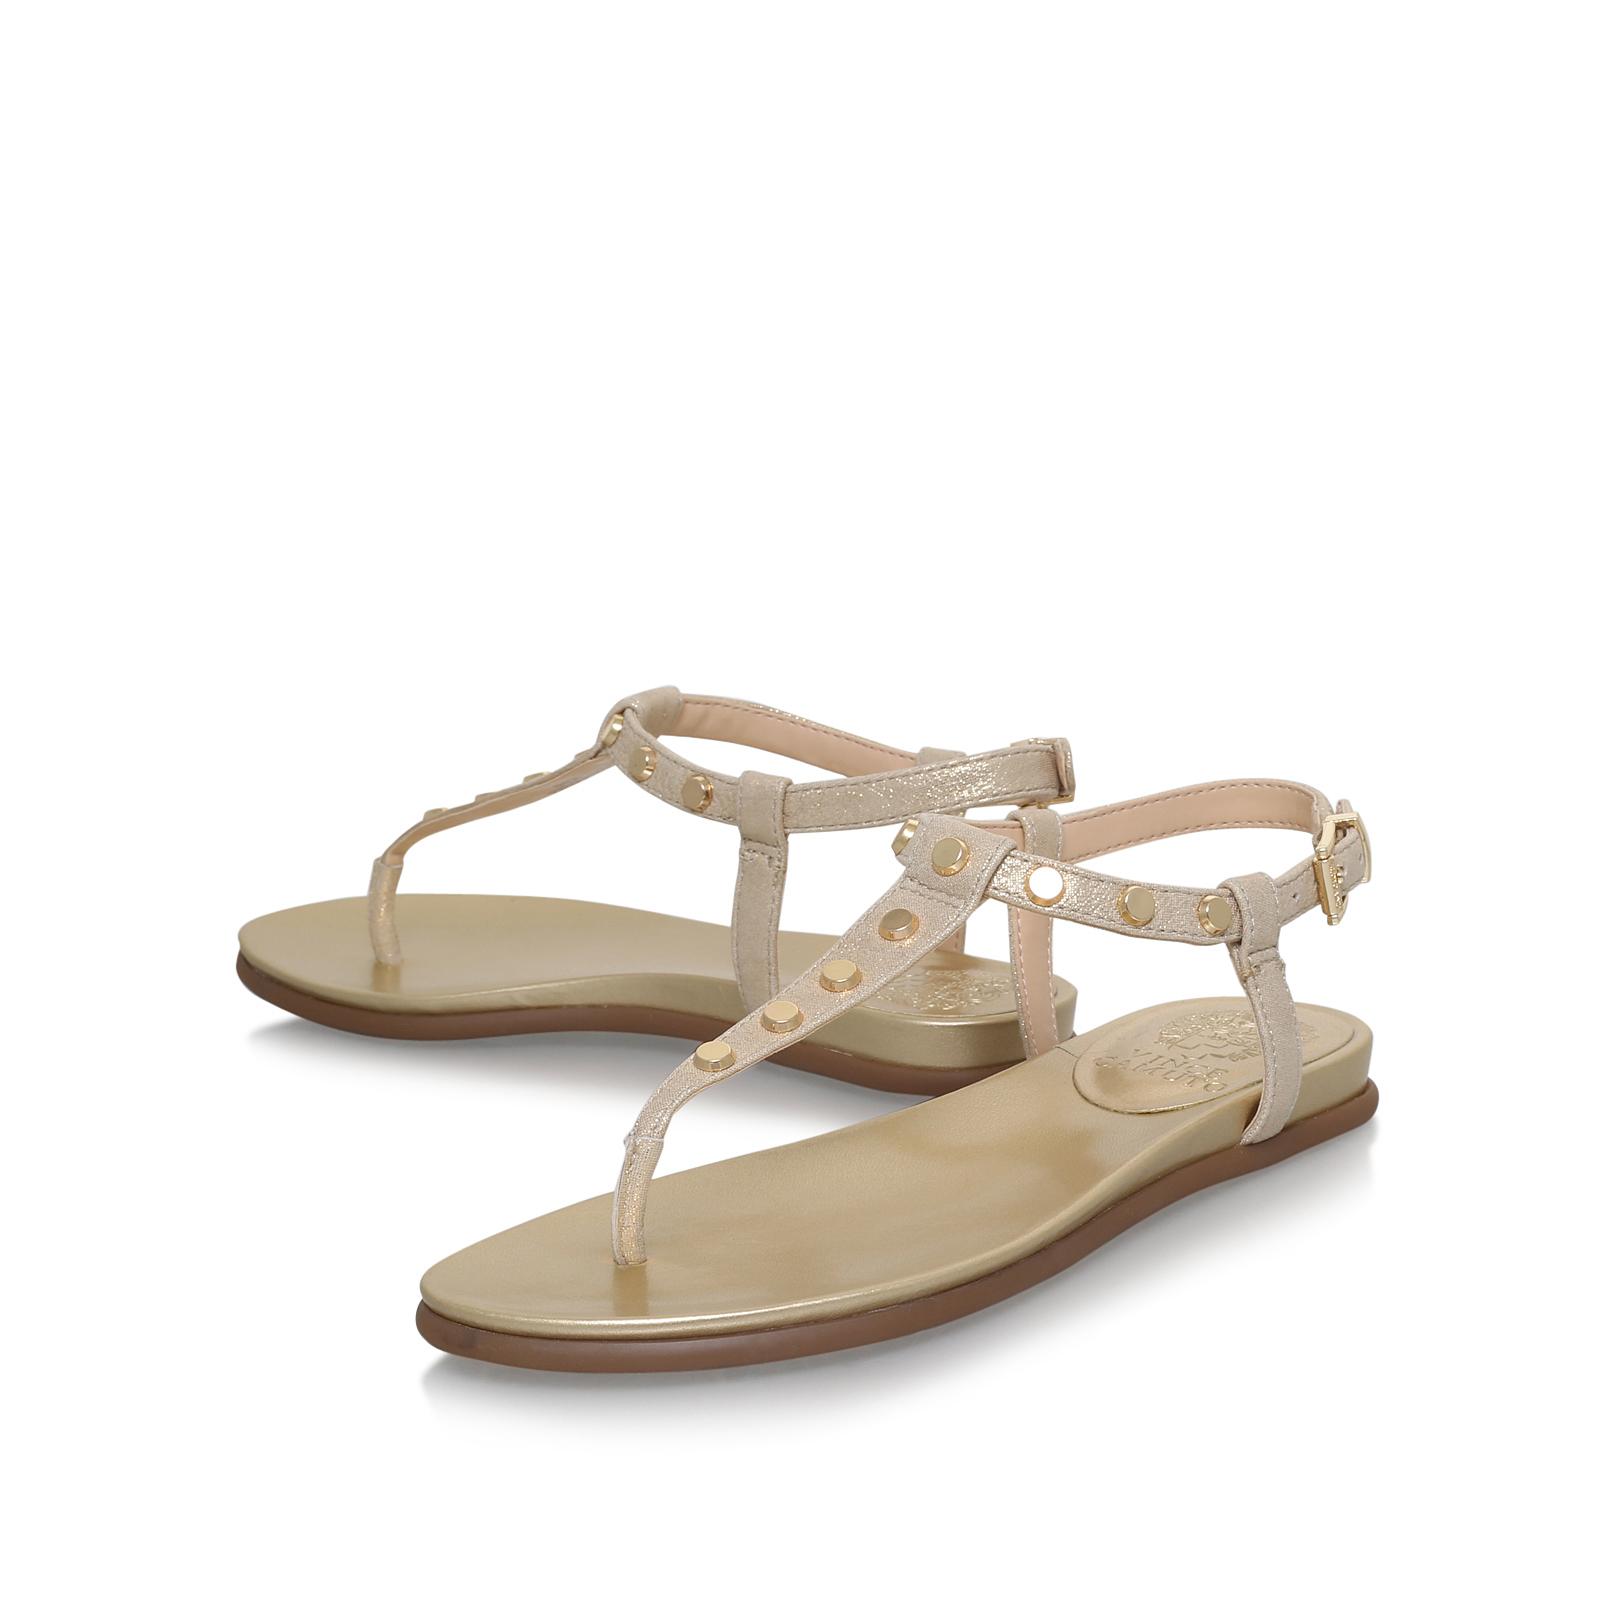 Estin Pink Flat Sandals By Vince Camuto 4s1d7ska